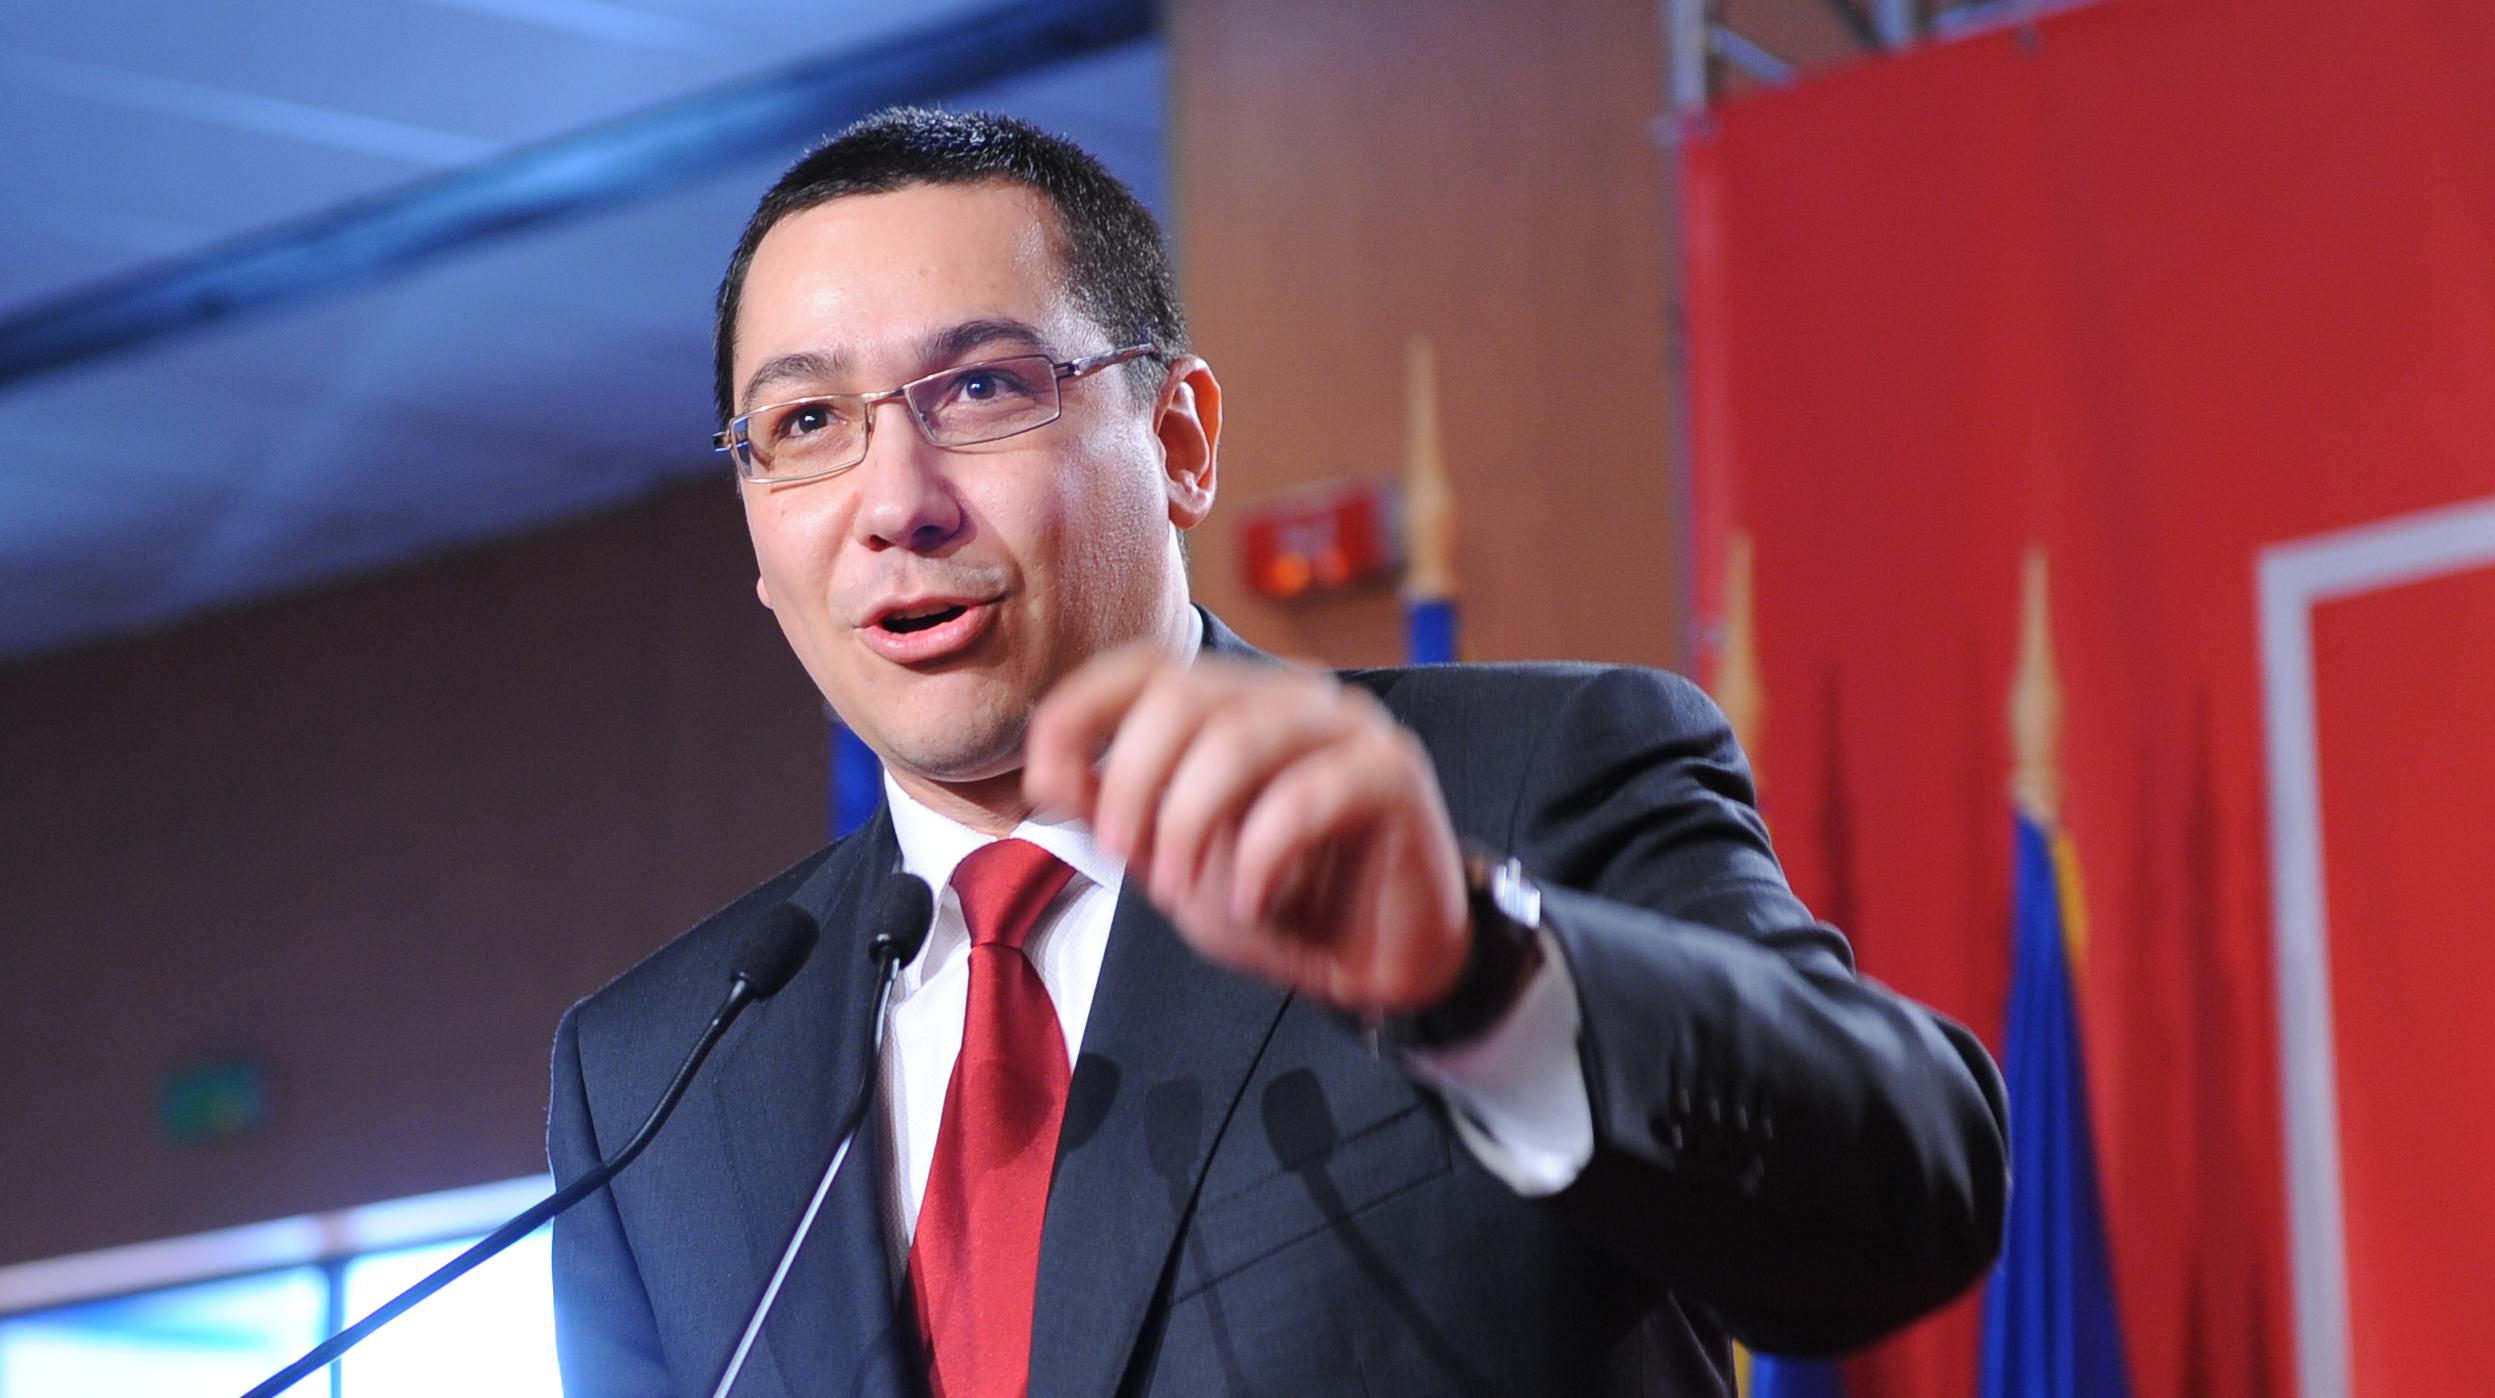 Victor Ponta isi lanseaza sambata candidatura la alegerile prezidentiale